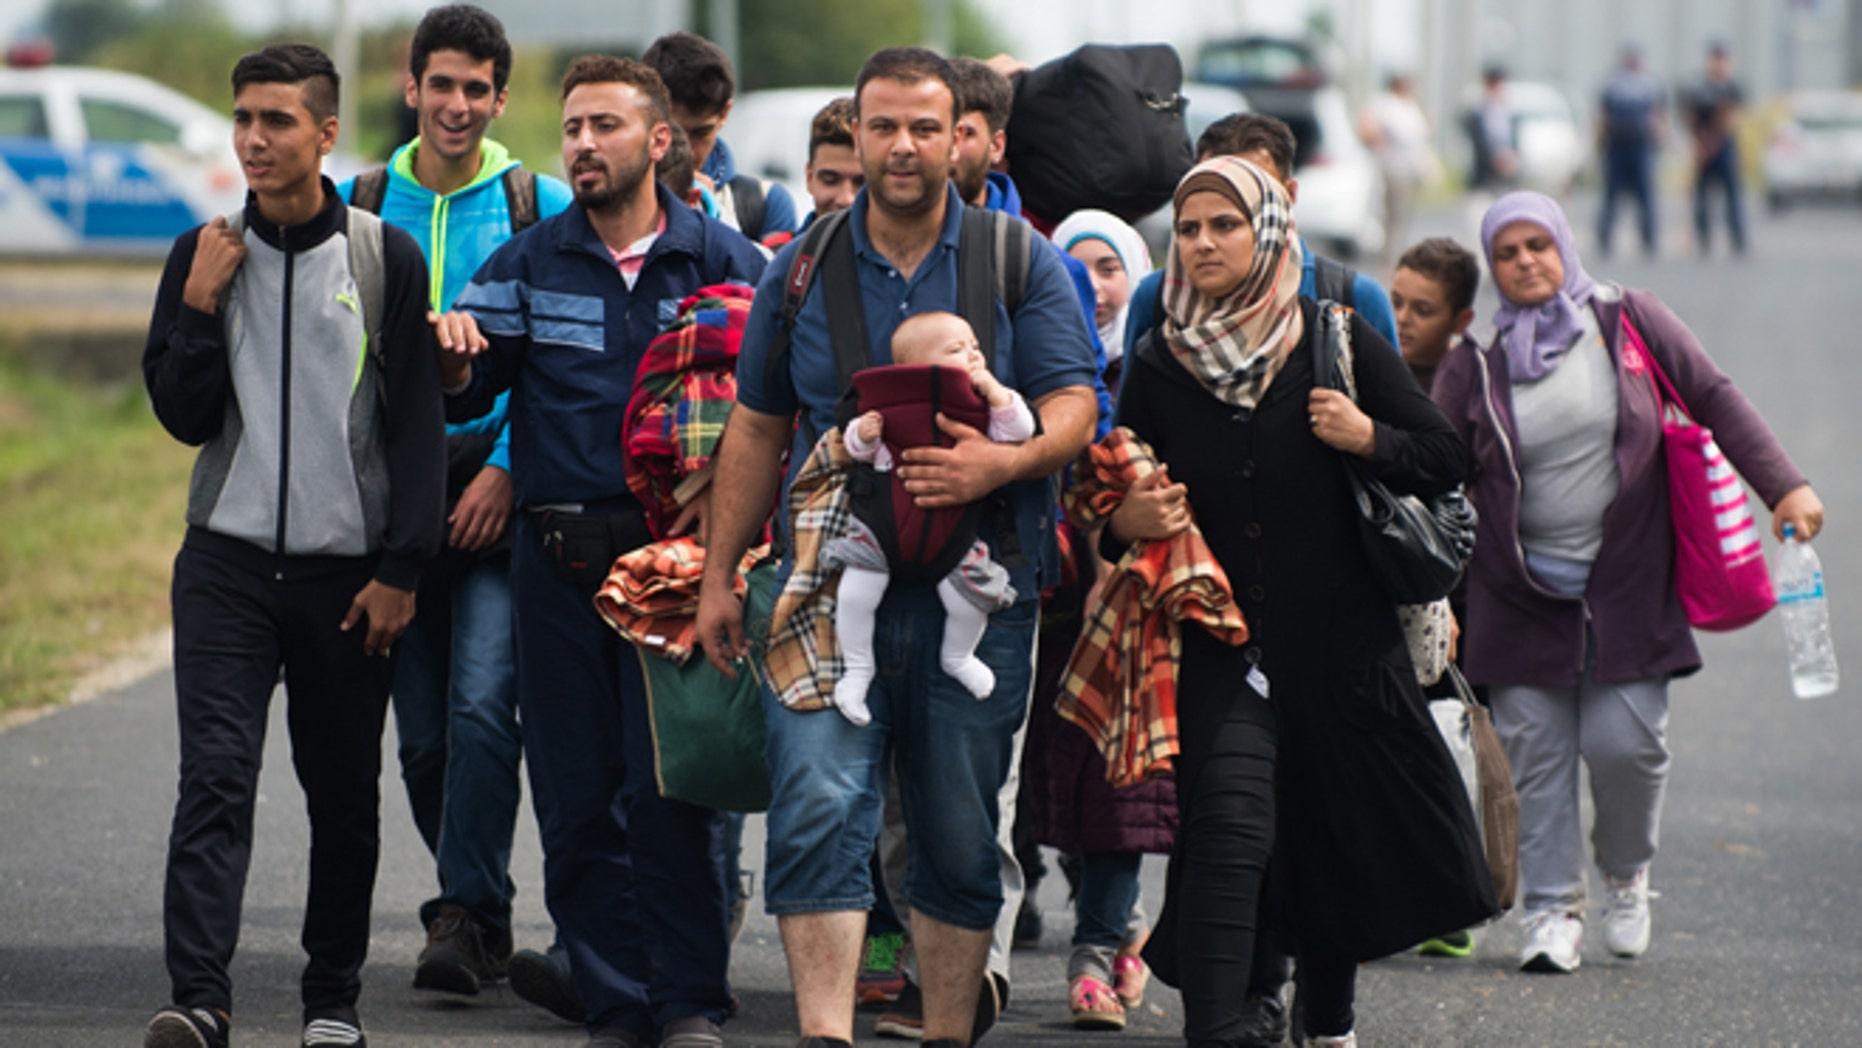 Sept. 14, 2015: Refugees arrive at the border between Austria and Hungary near Heiligenkreuz.